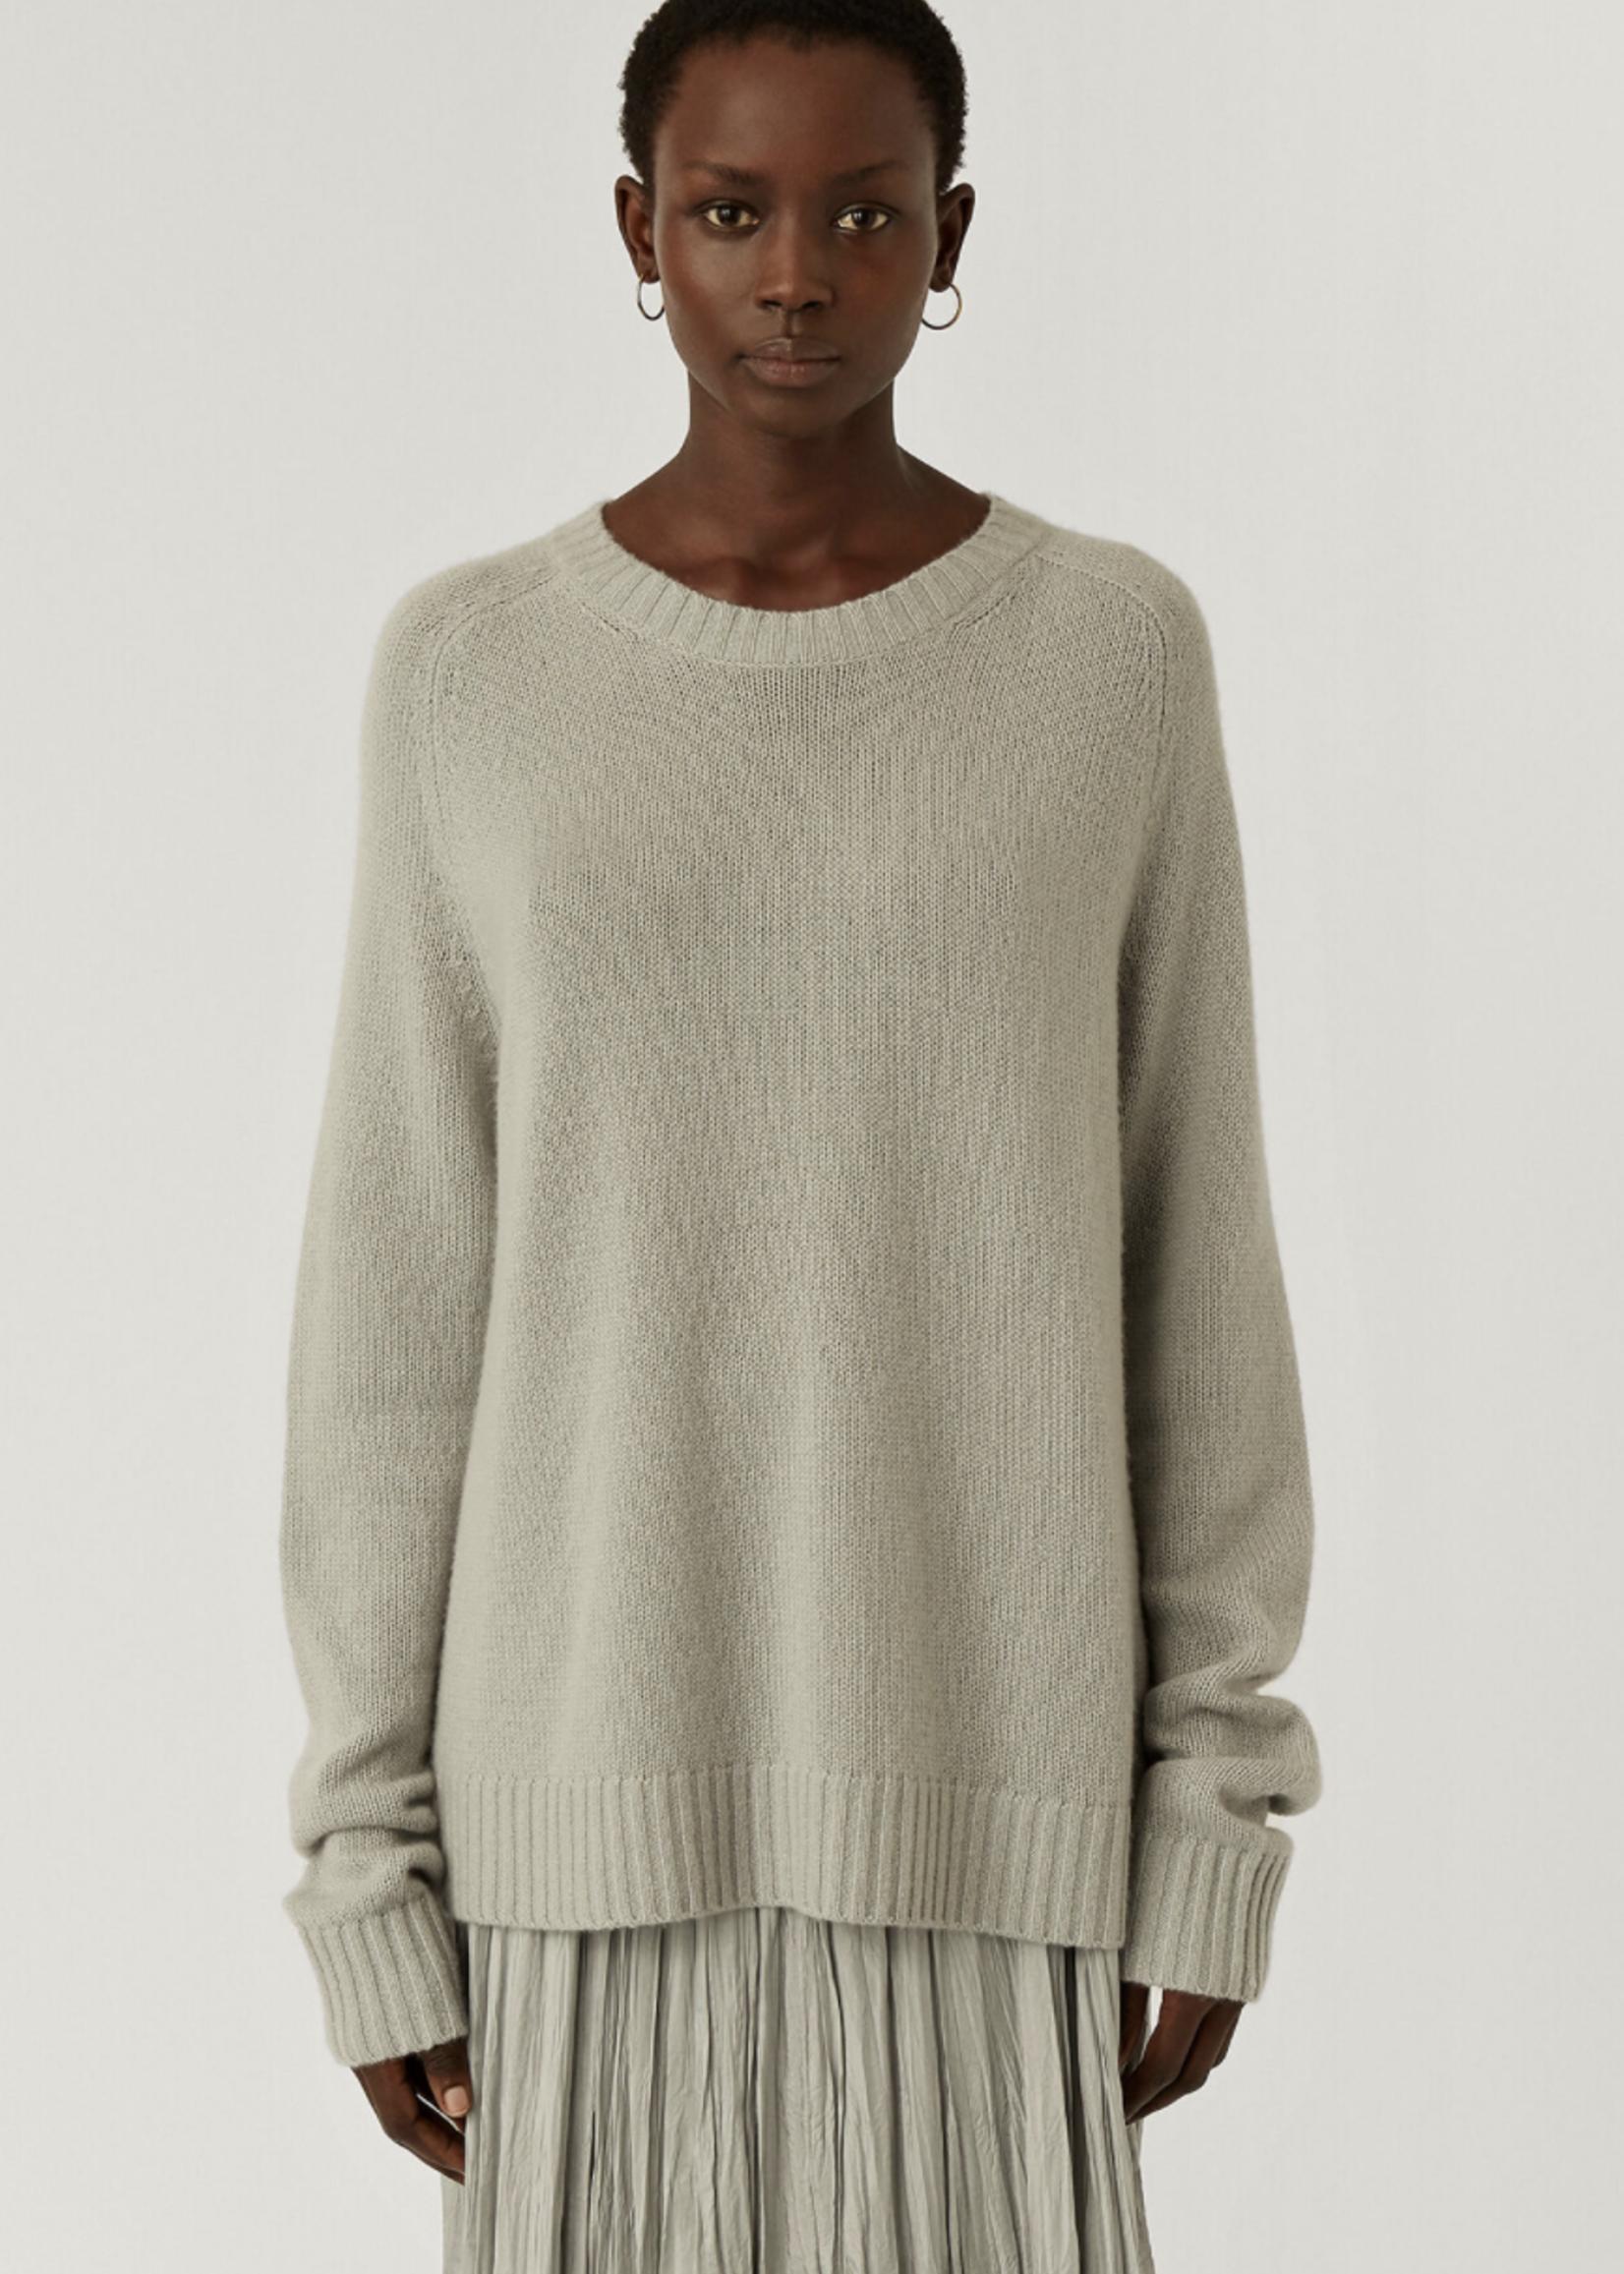 Joseph joseph rnd neck longsleeve cashmere pullover , cloud